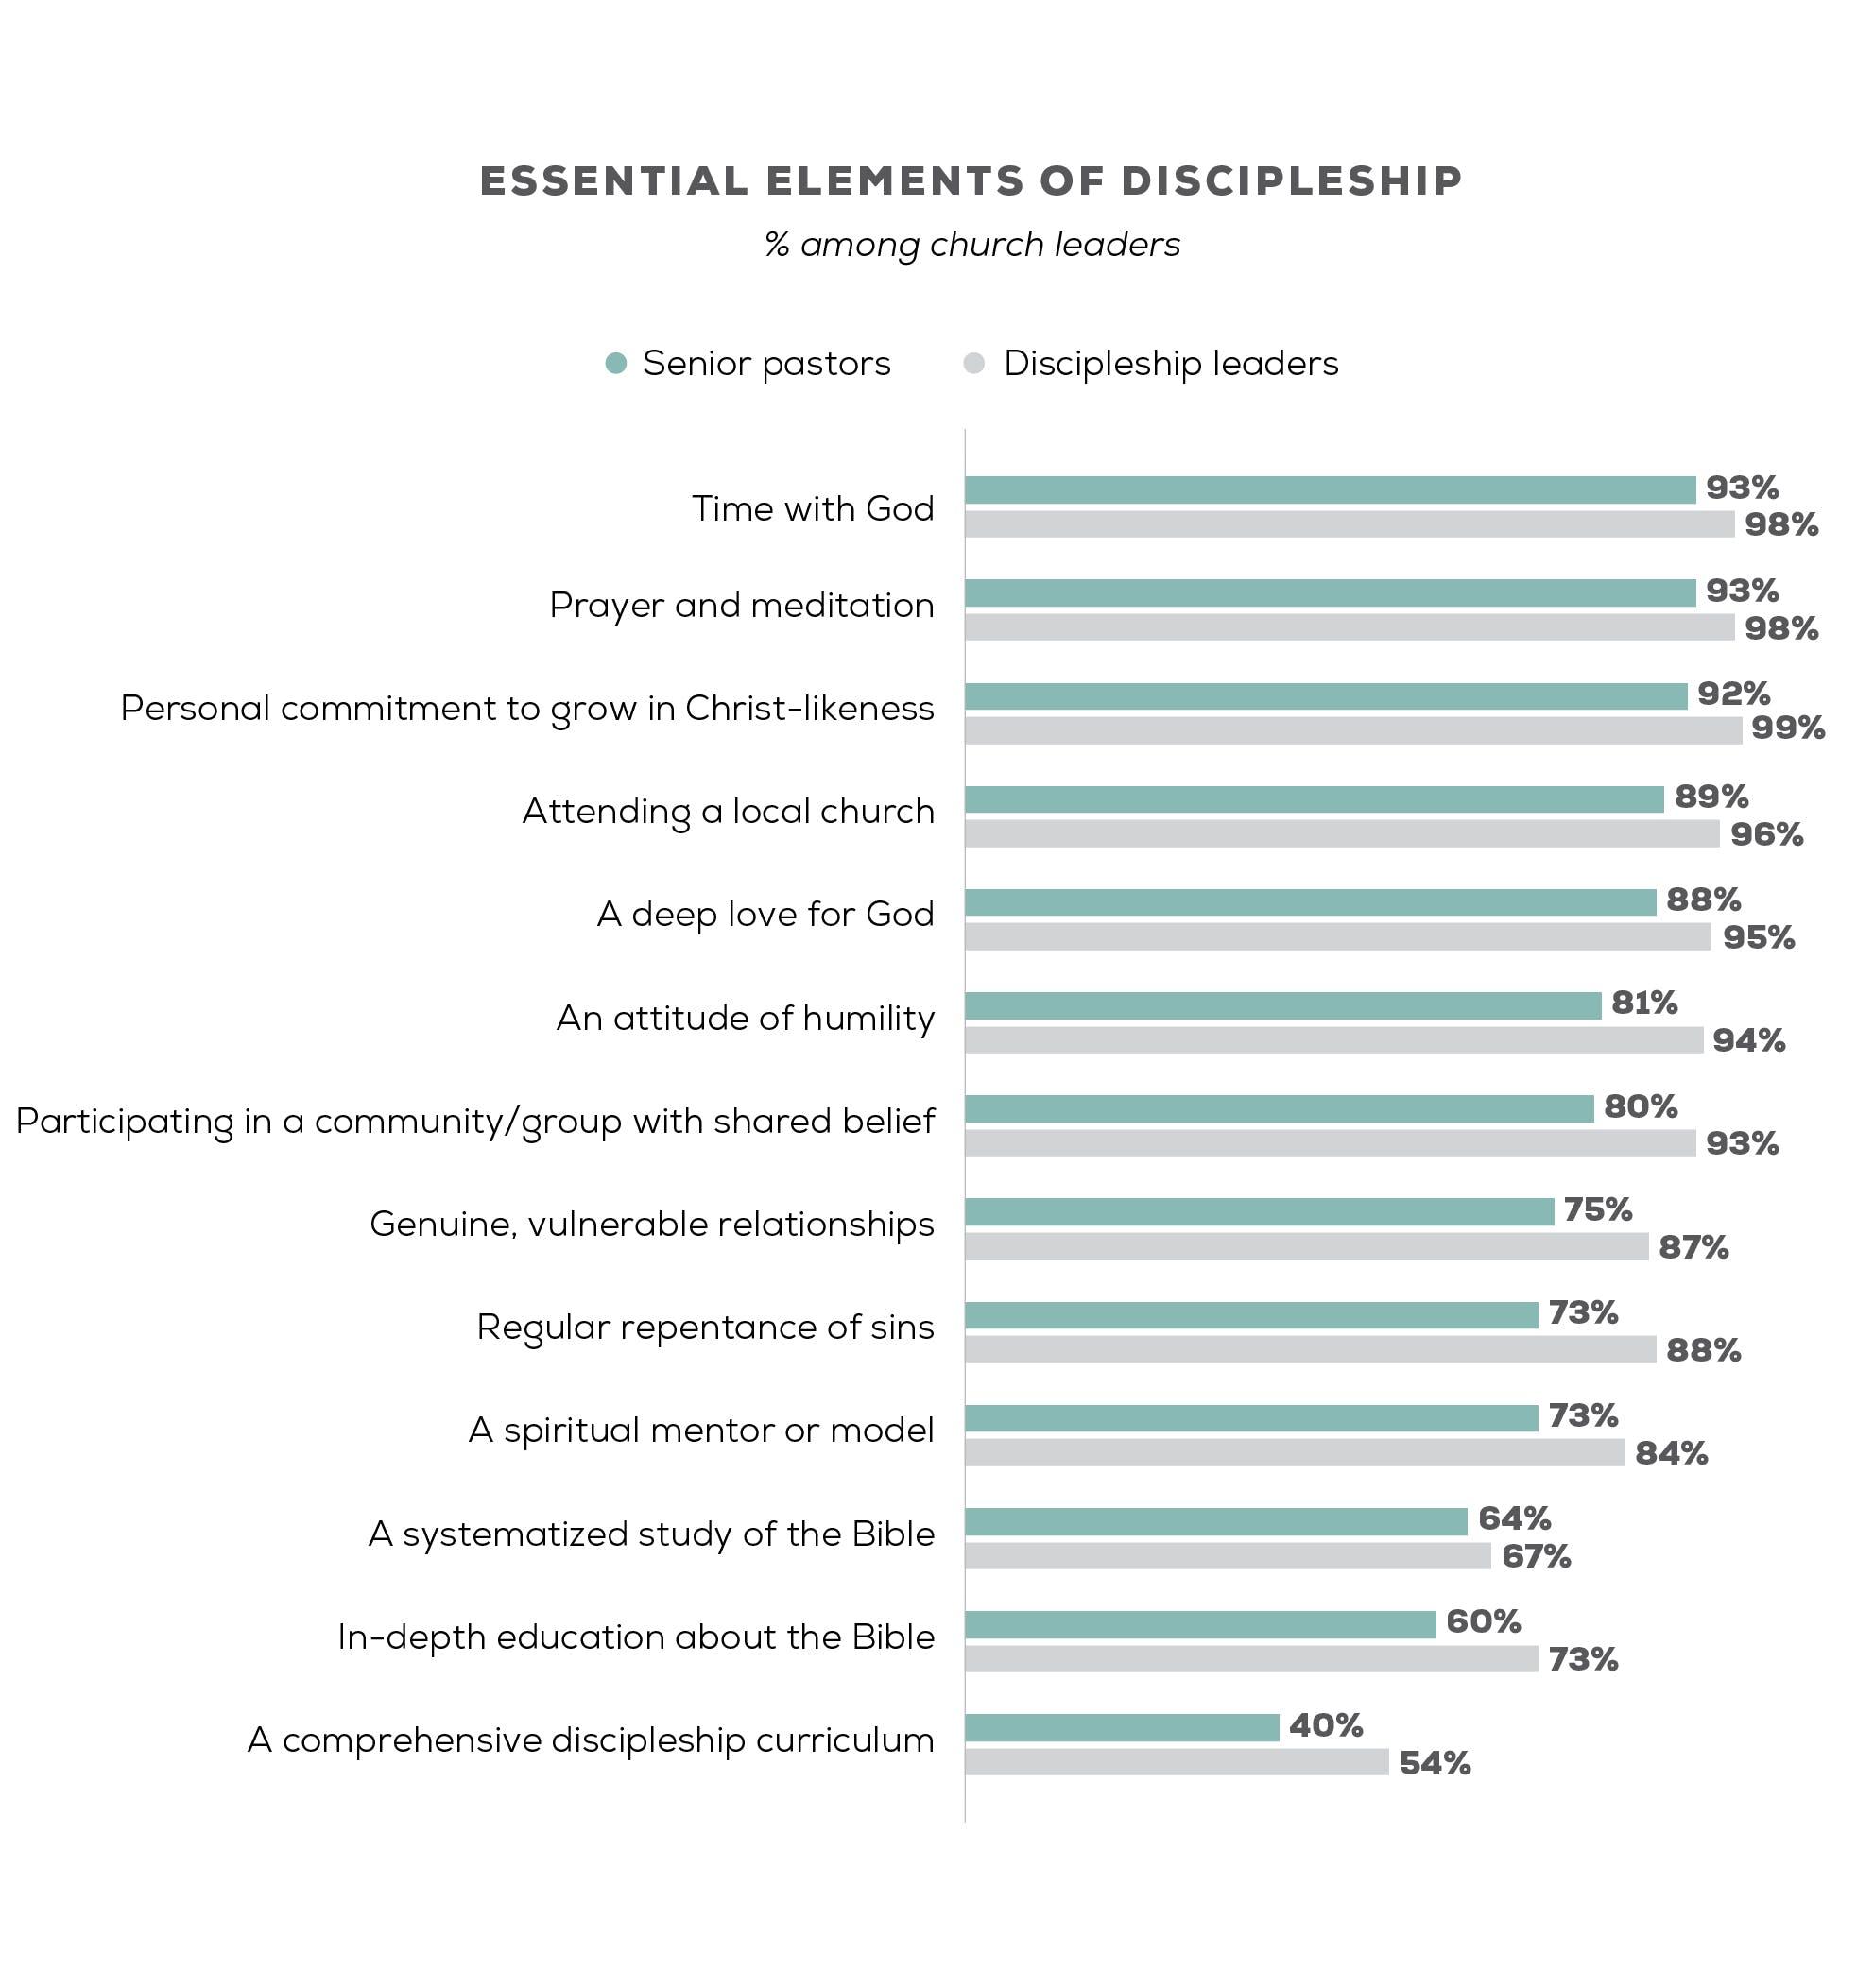 essential elements of discipleship